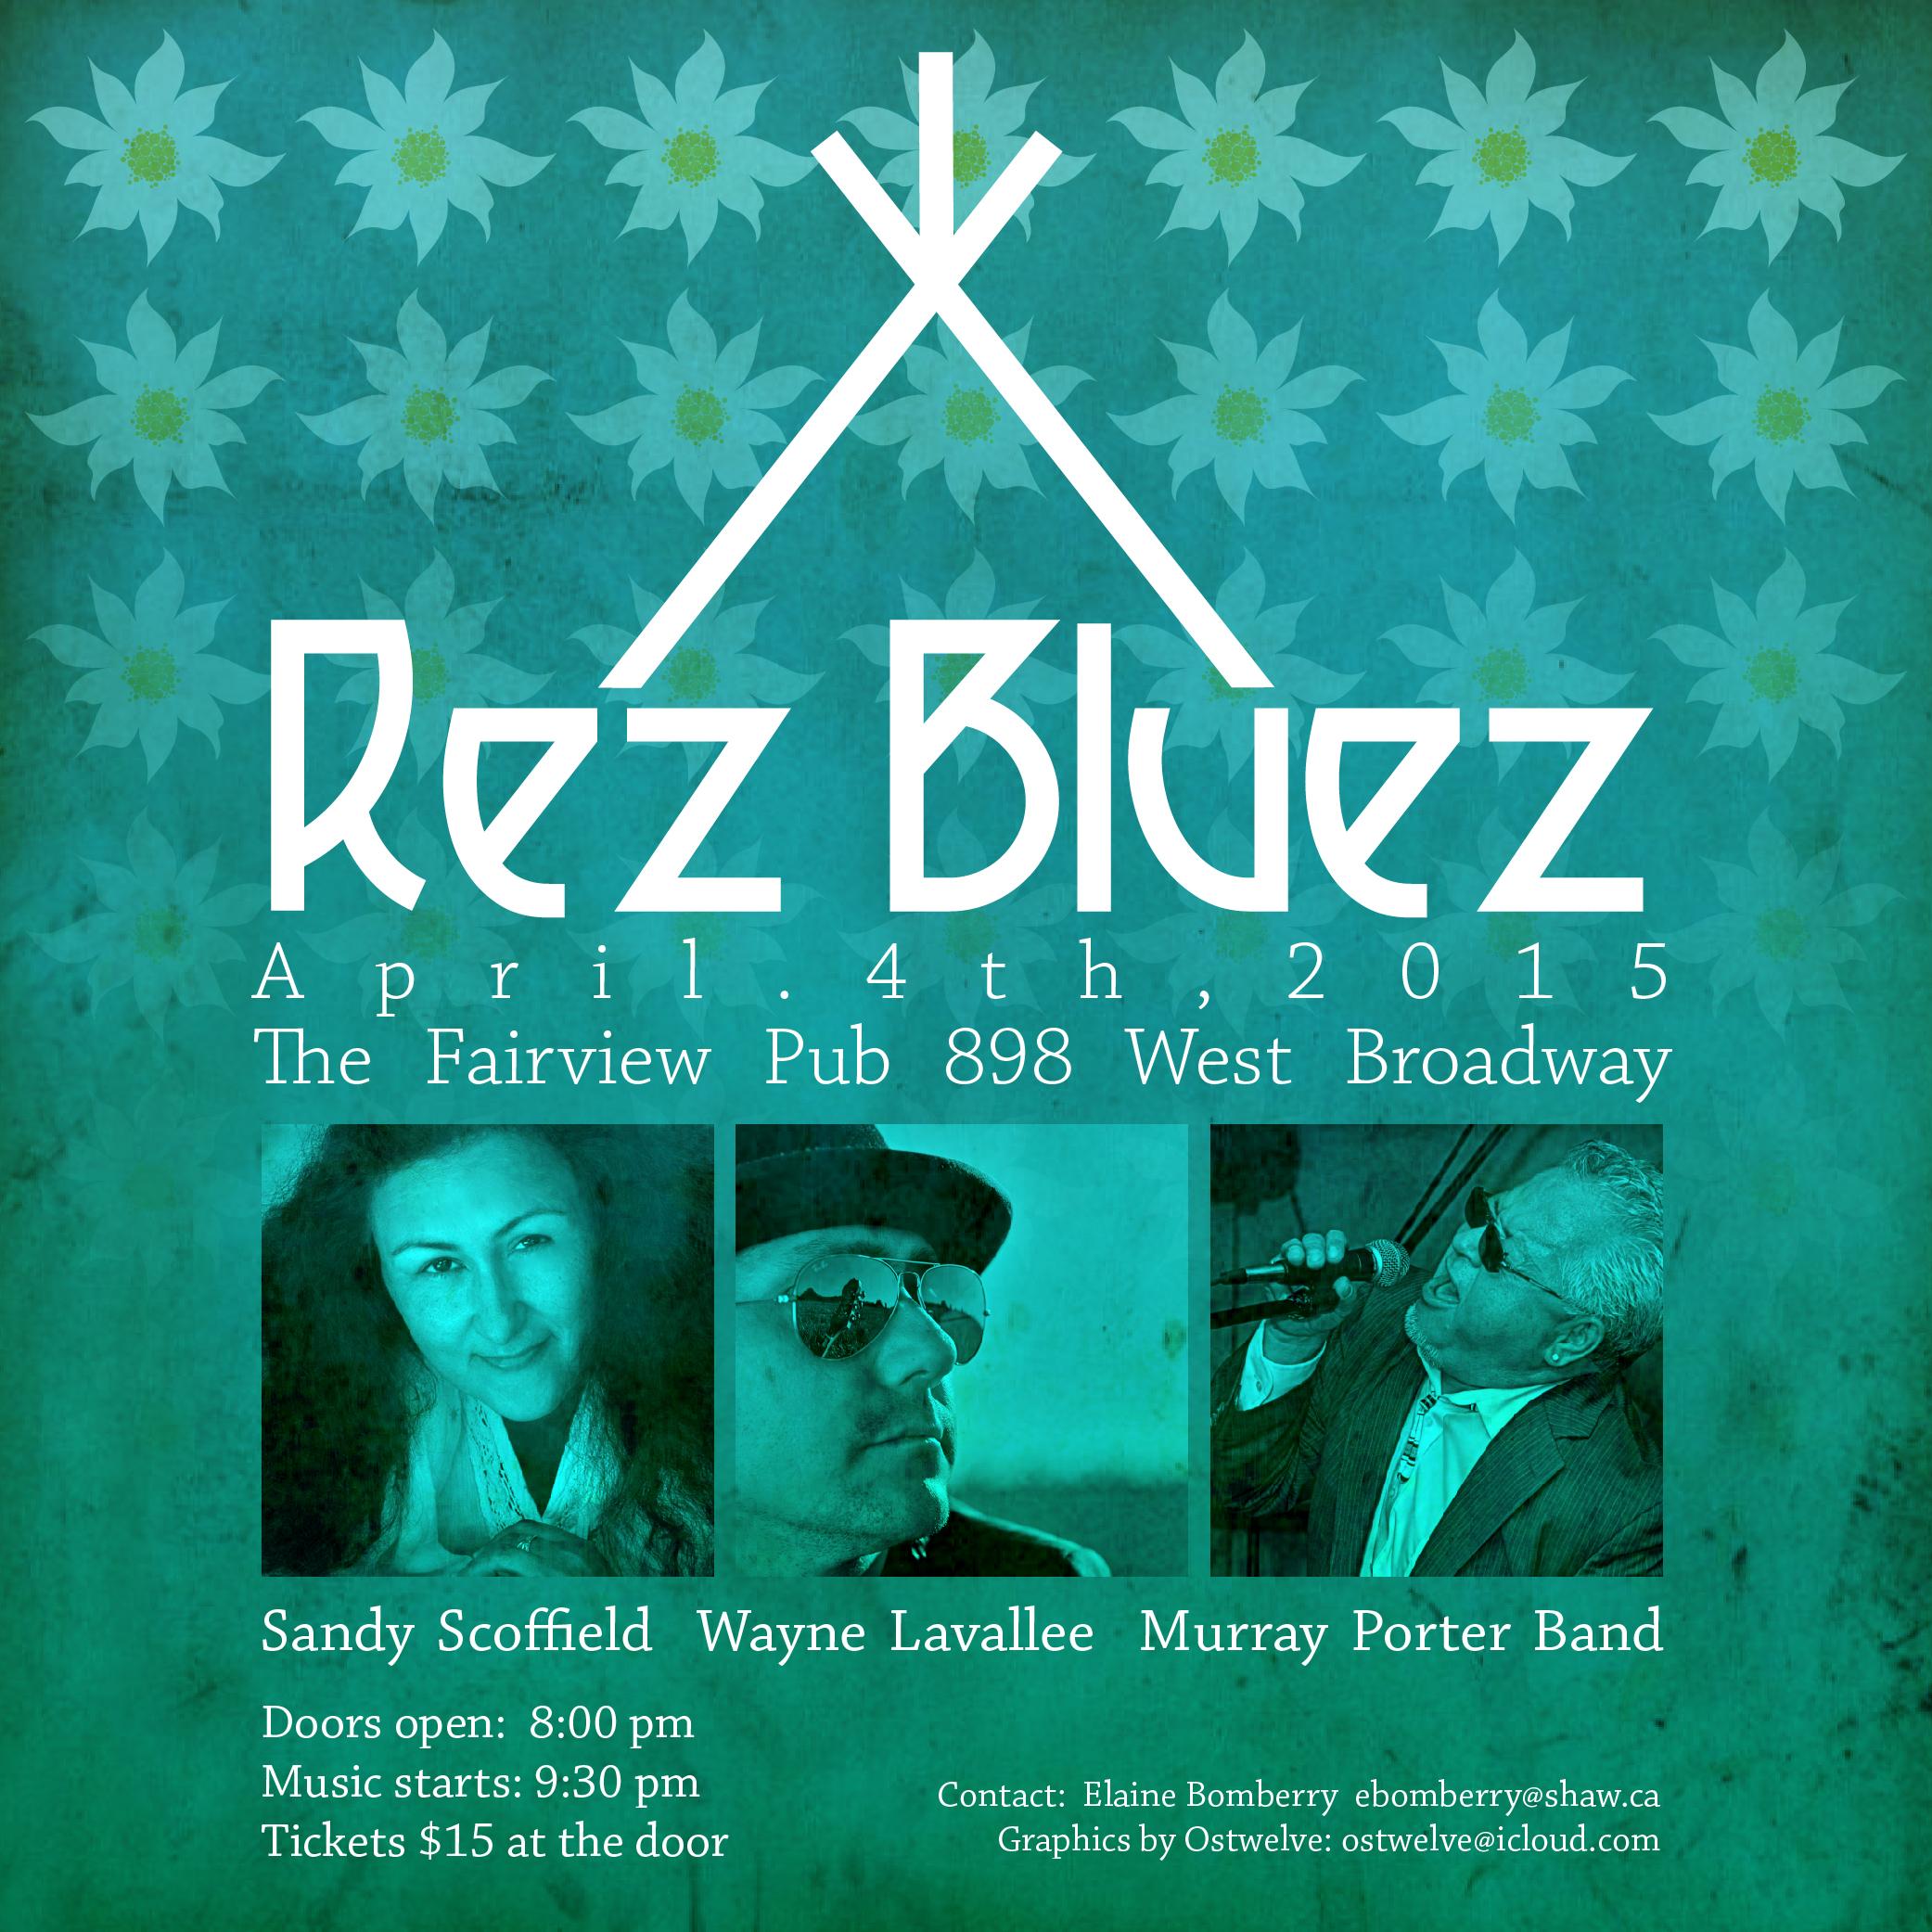 rezblues-spring2015-instasquare-01